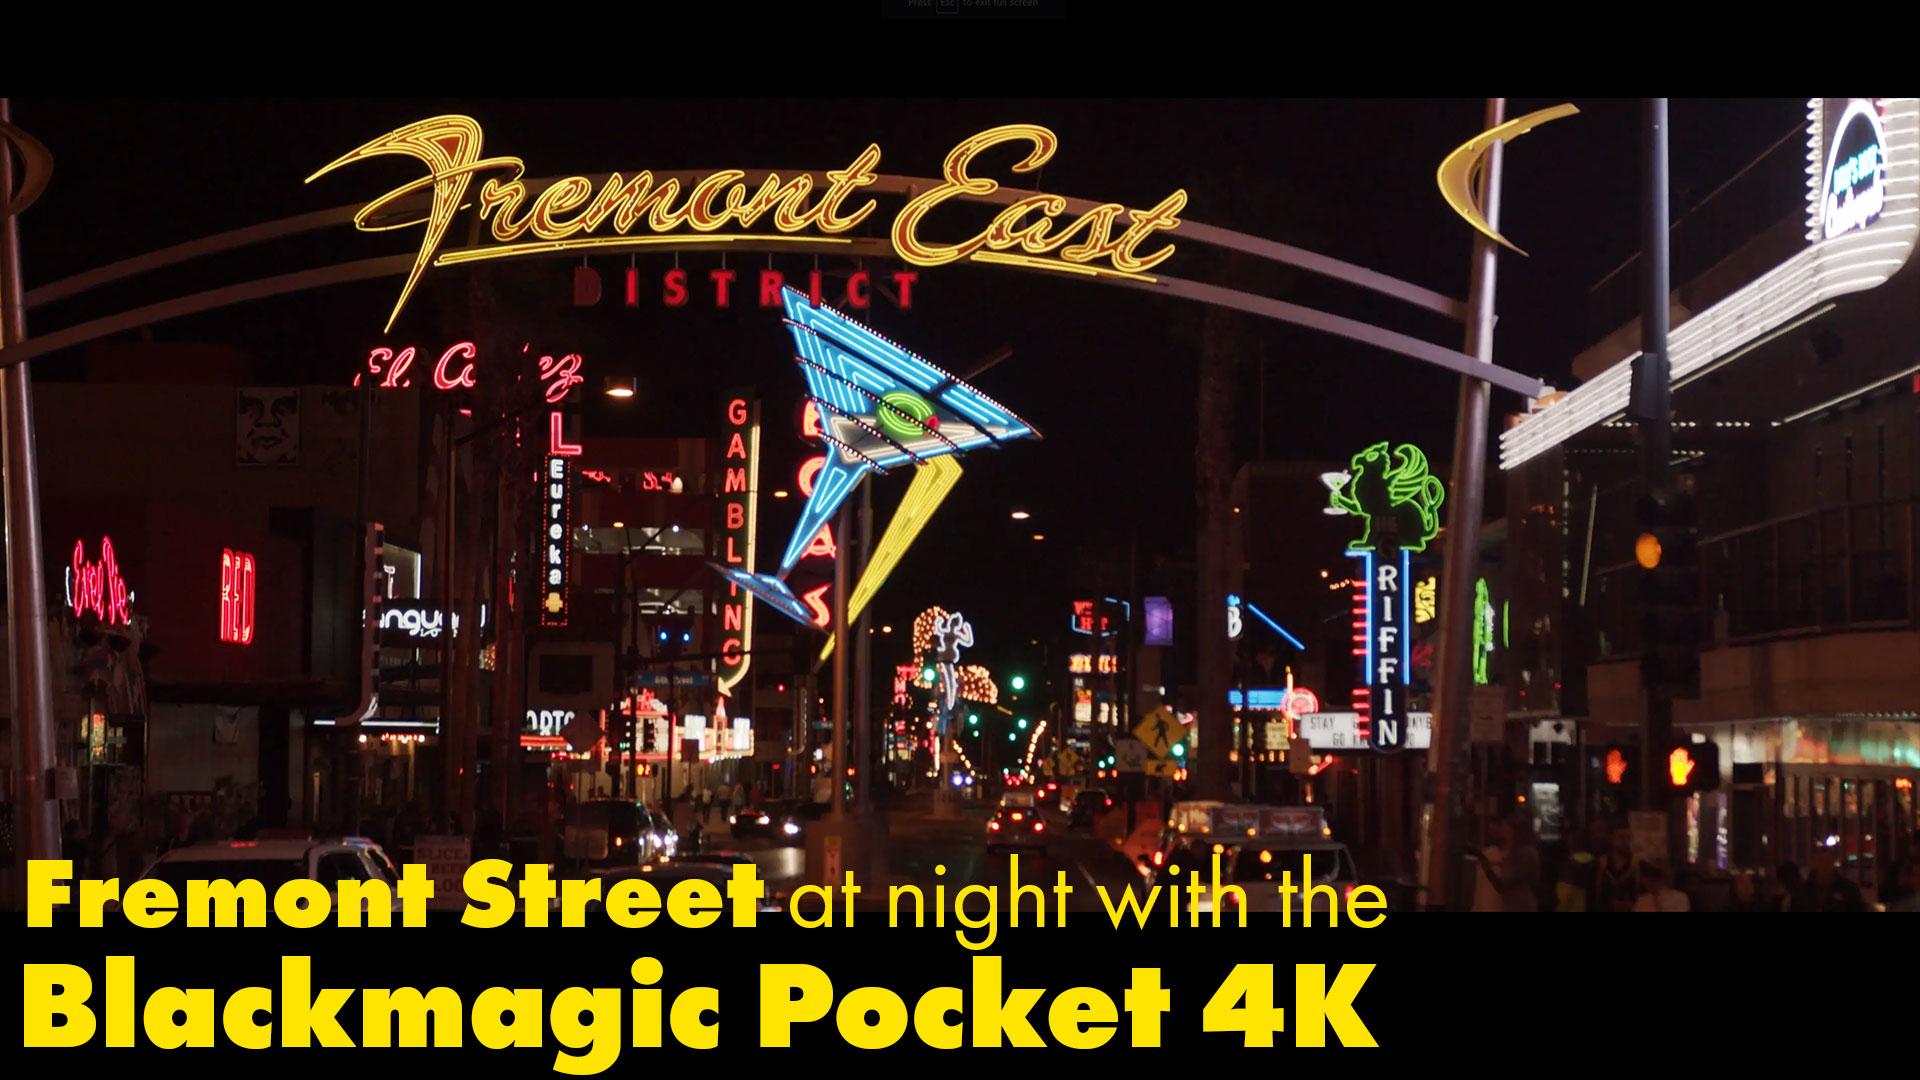 The Blackmagic Pocket 4K at night on Fremont Street in Las Vegas